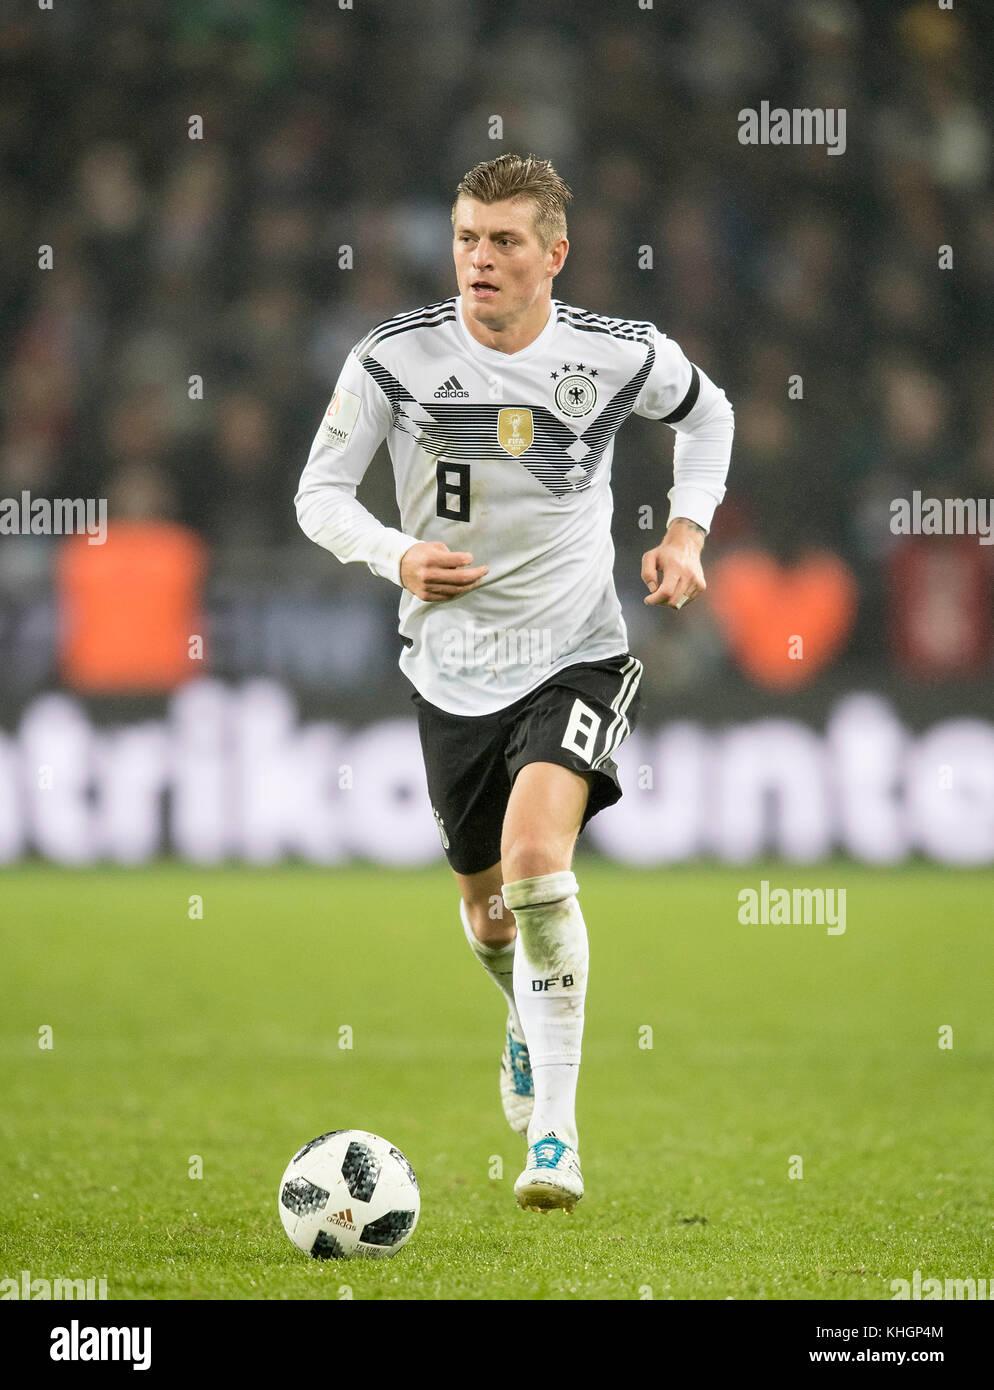 Koeln Deutschland 14th Nov 2017 Toni Kroos Ger Aktion